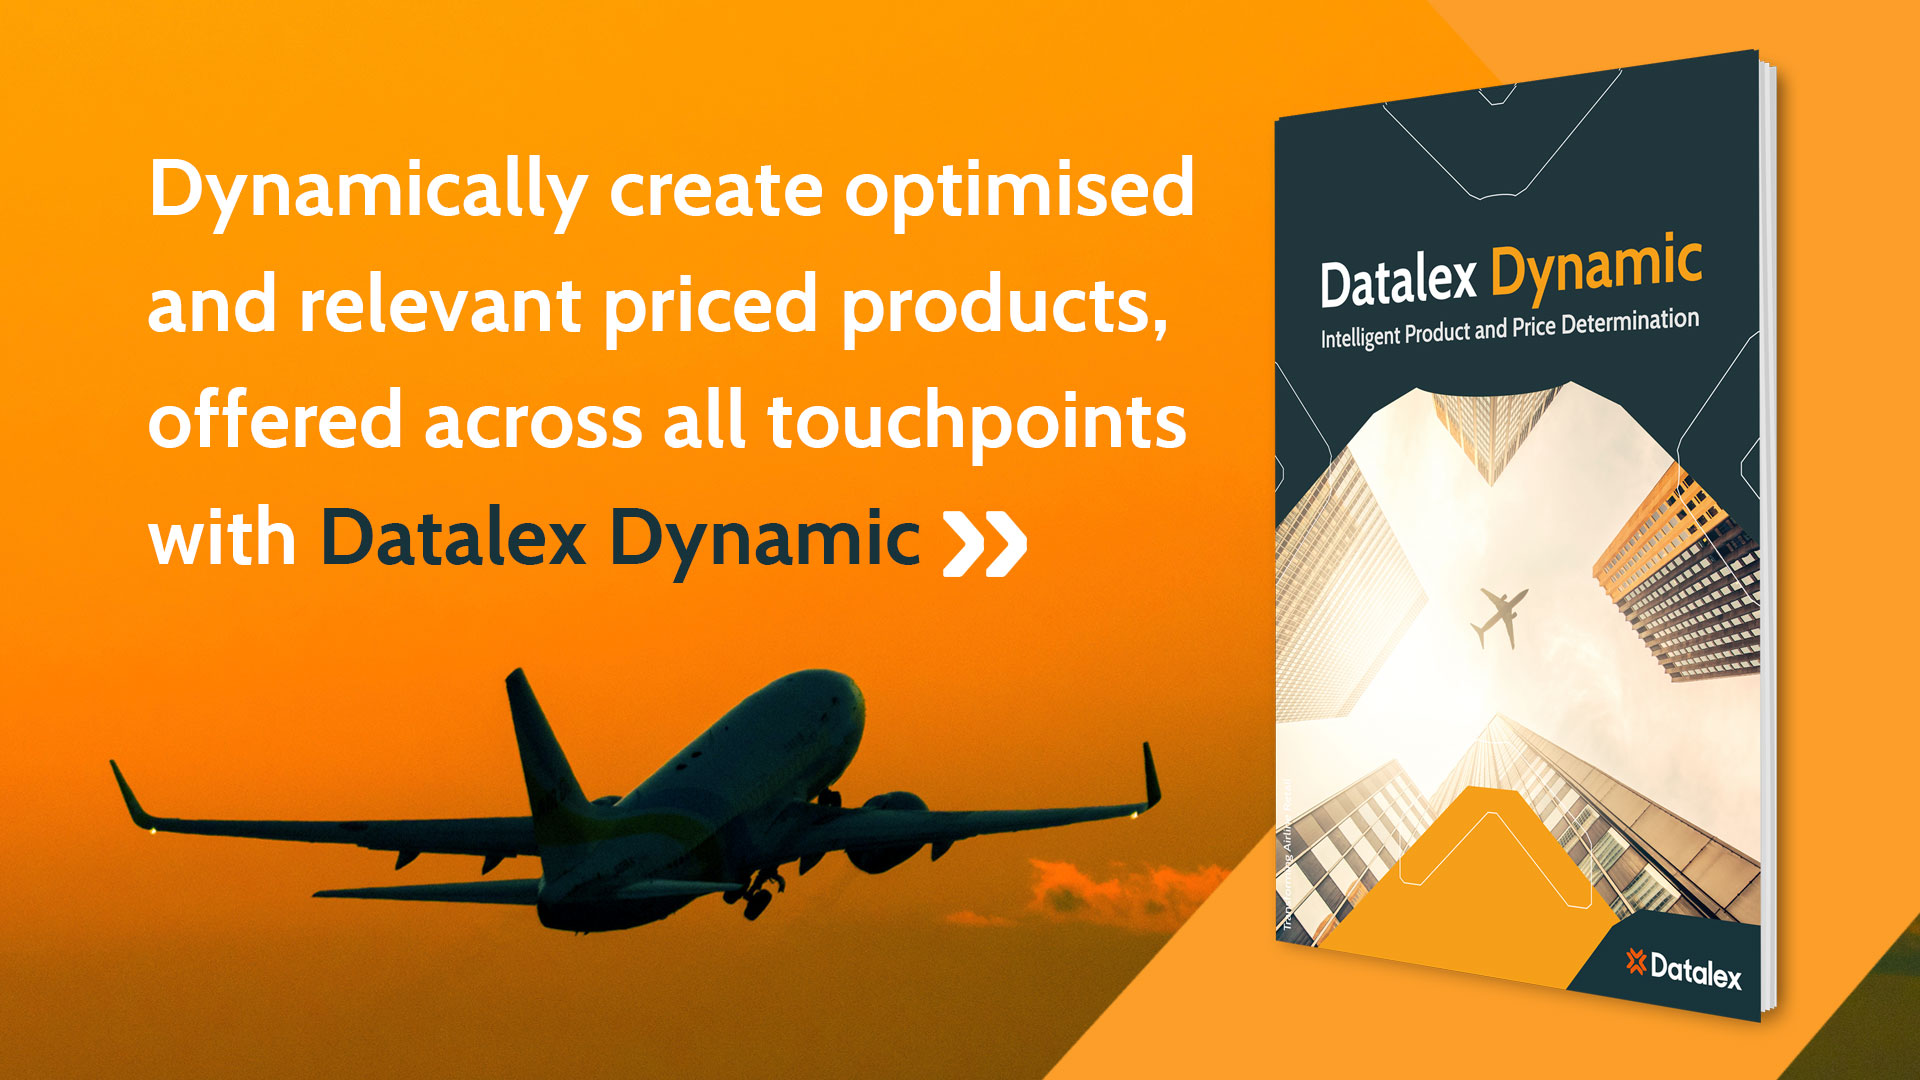 Datalex Dynamic